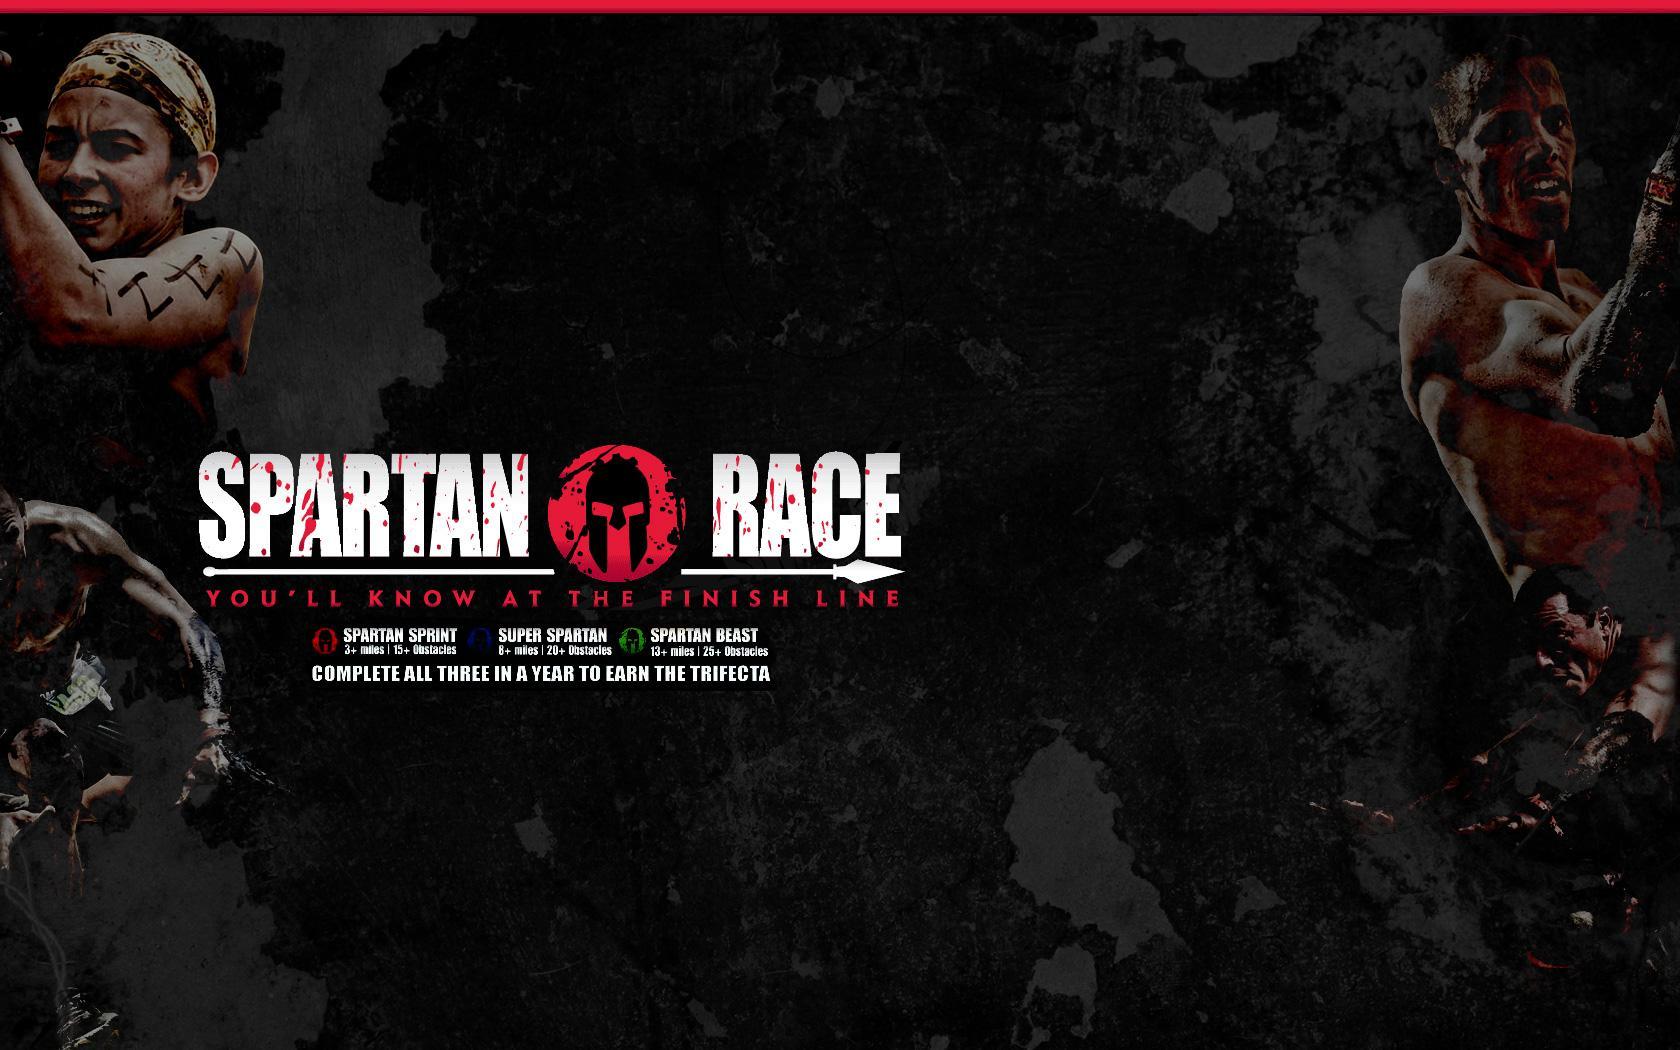 Spartan Race Wallpaper Quotes QuotesGram 1680x1050